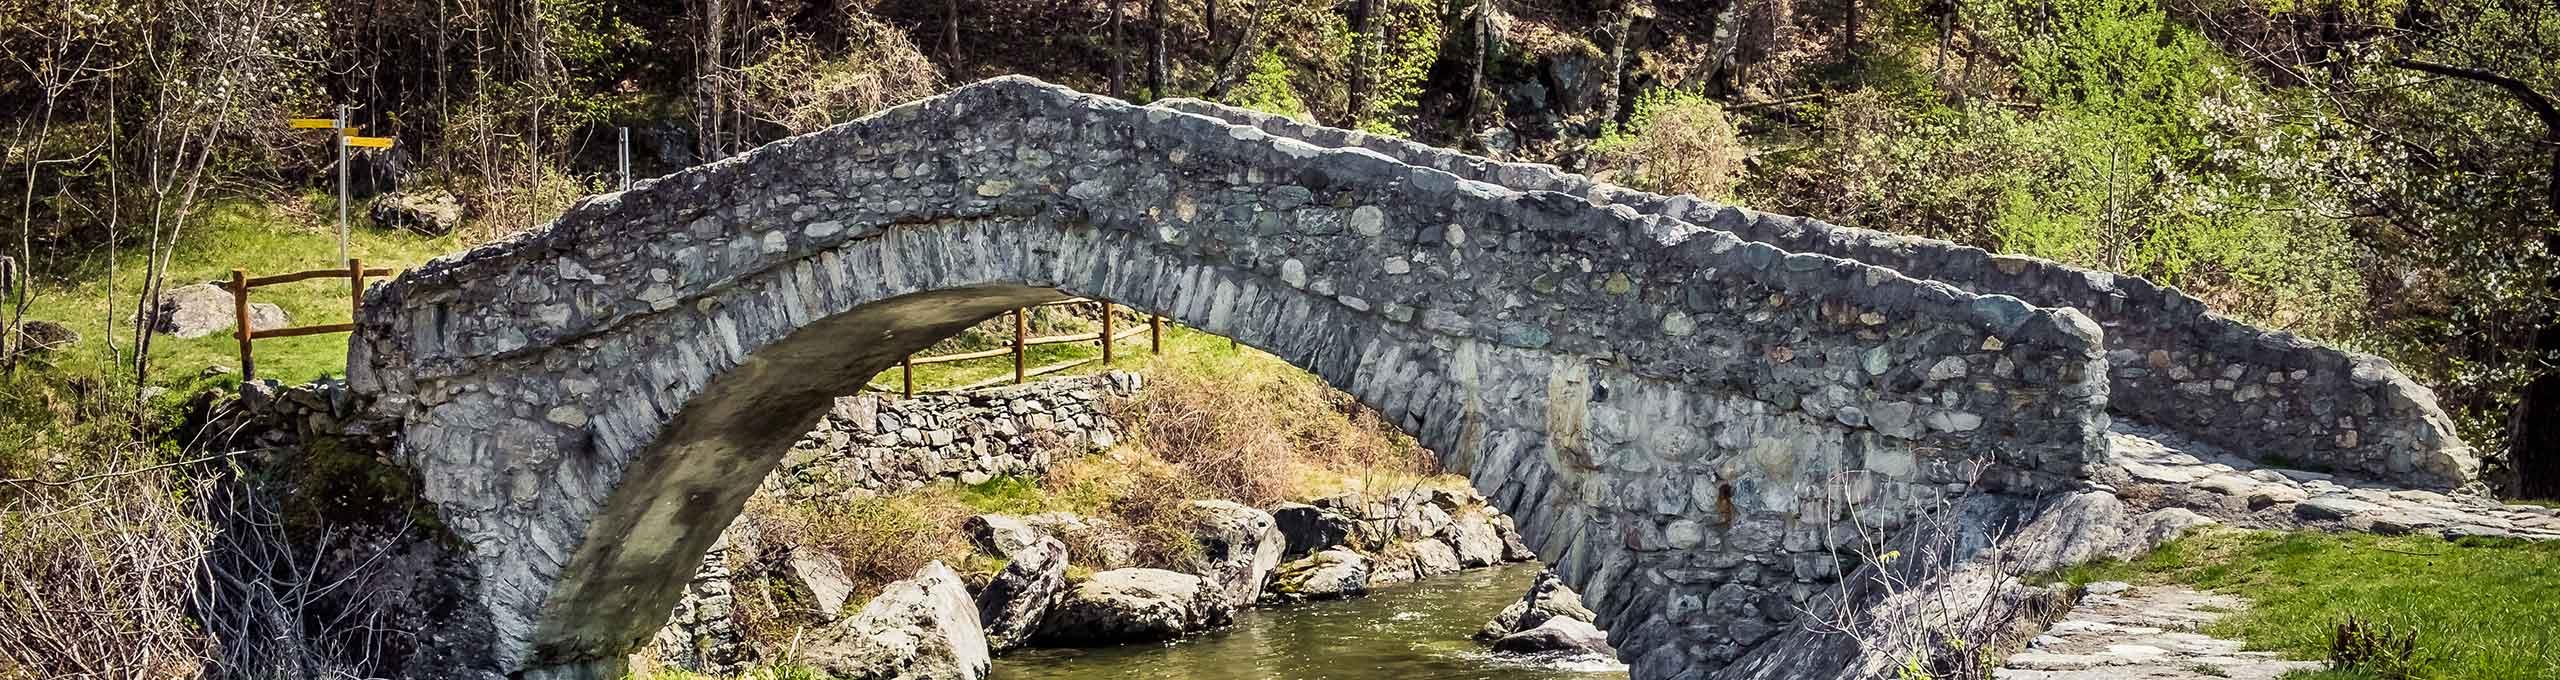 Ponte romano, Challand Saint Victor